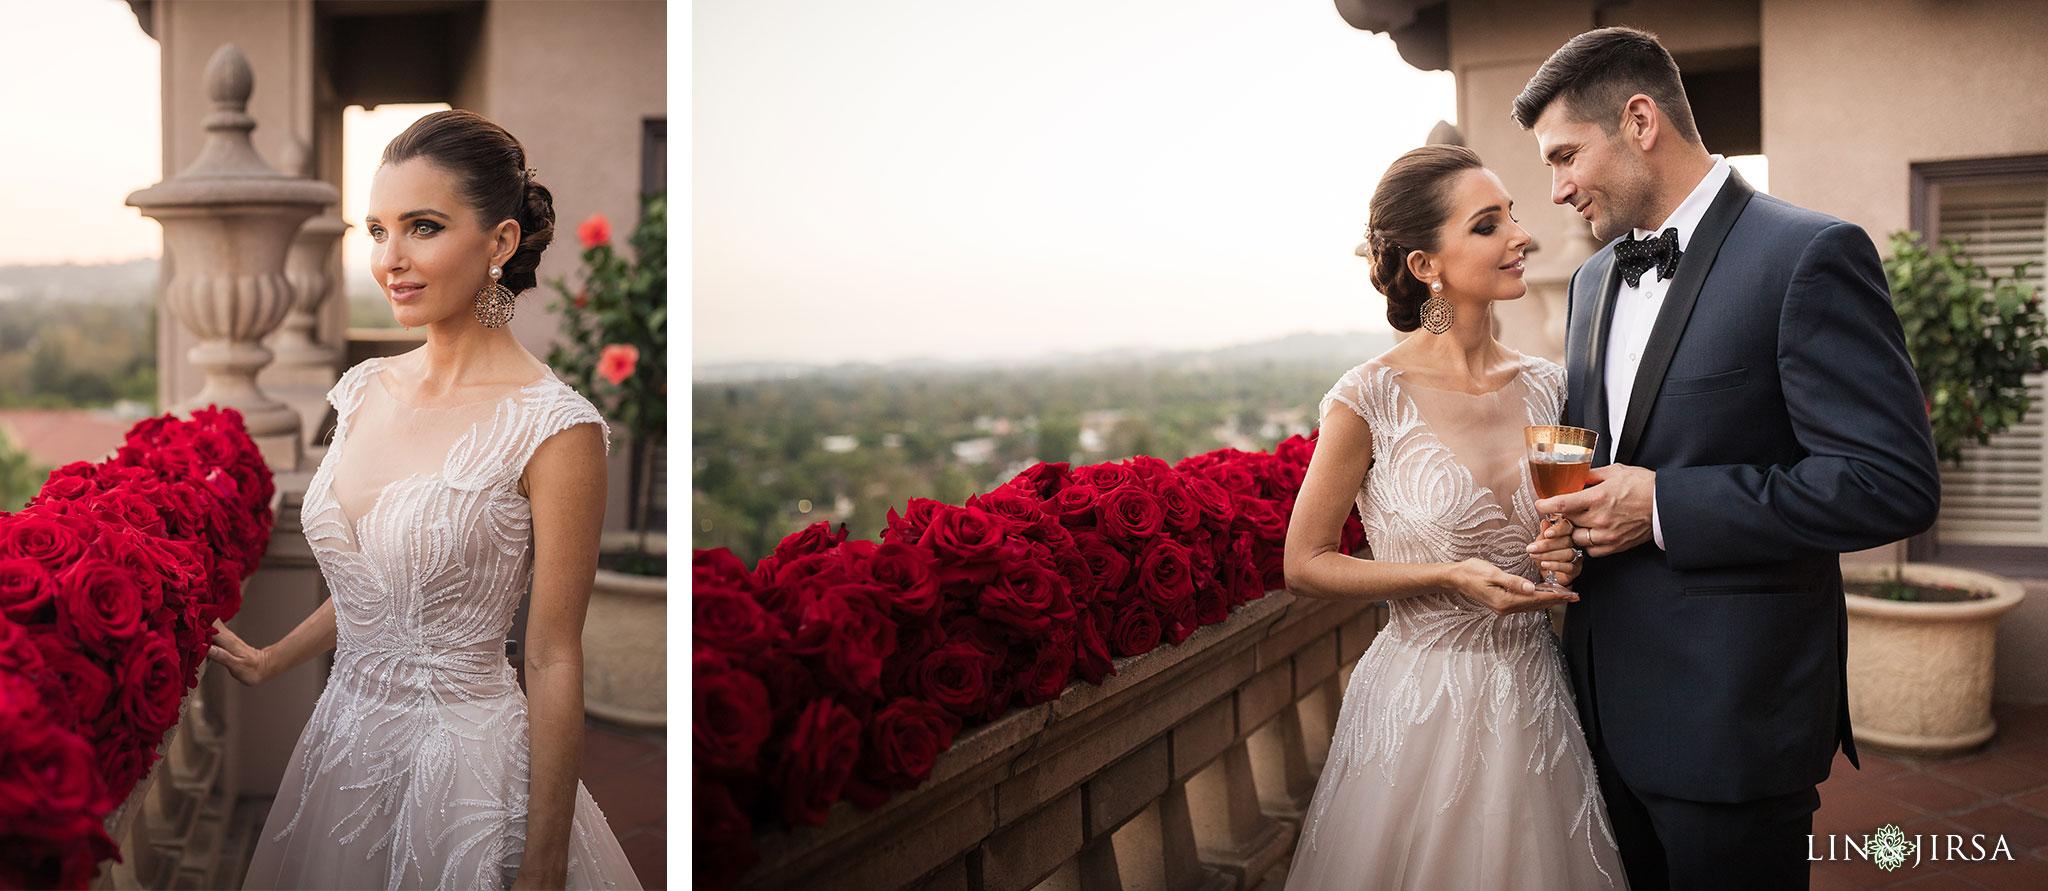 22 langham pasadena jewish couple reception photography